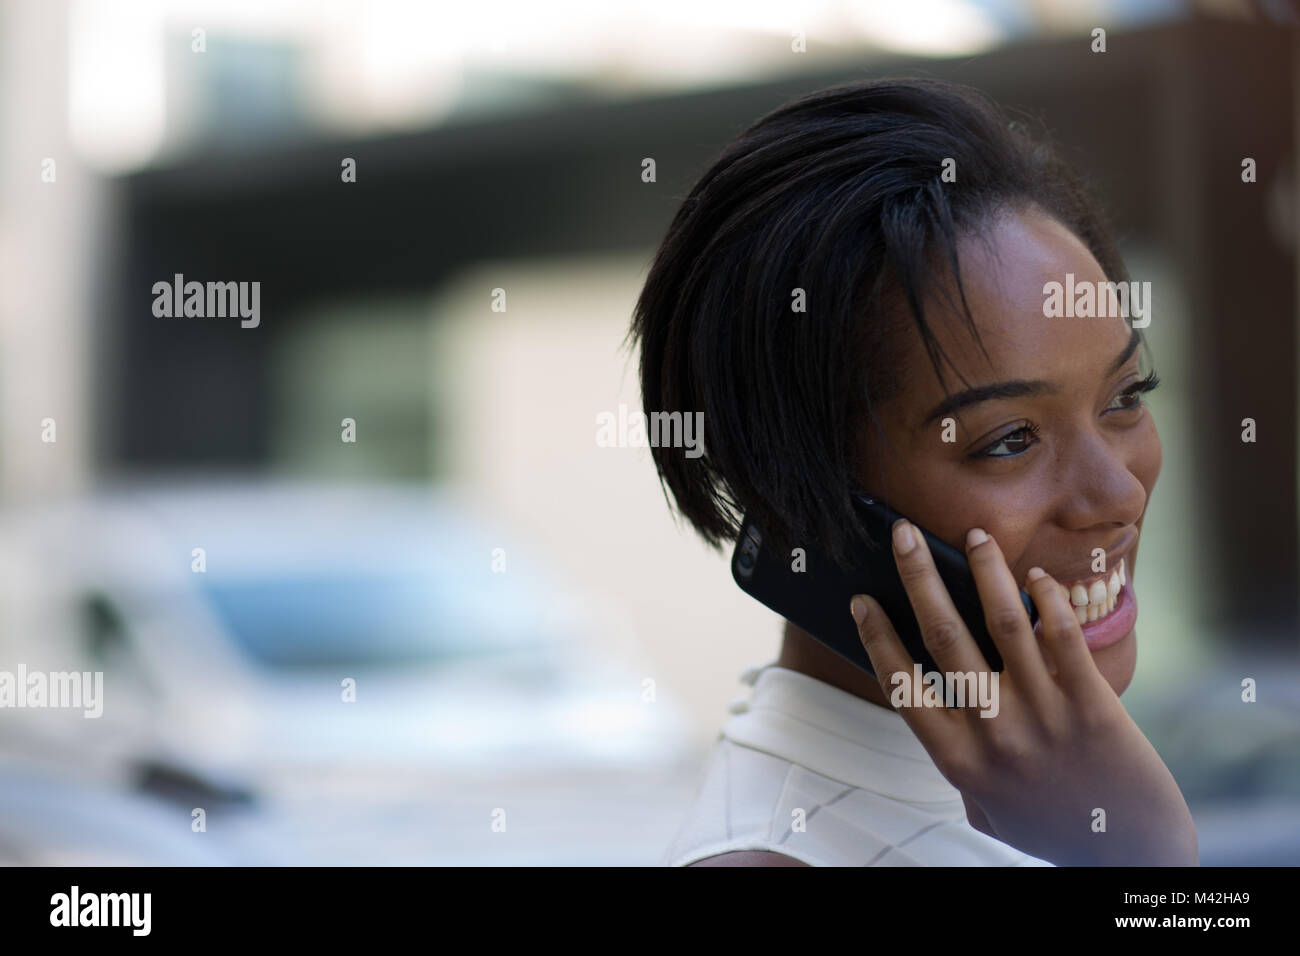 Businesswoman on way to work using smartphone - Stock Image